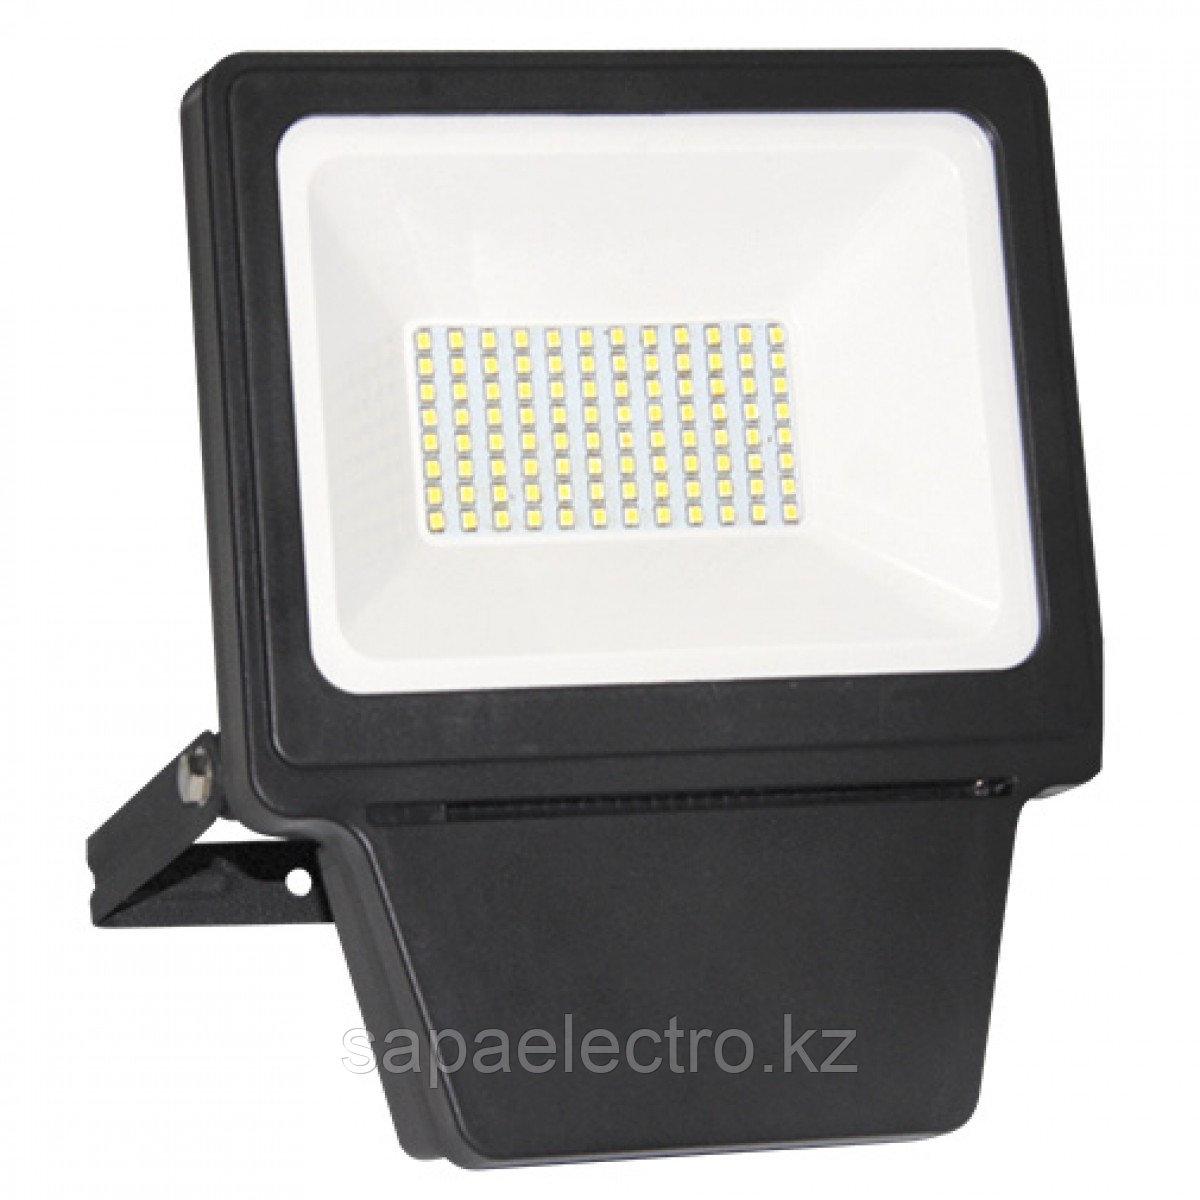 Прожектор LED SMD 50W BLACK 6000K  (TS)20шт